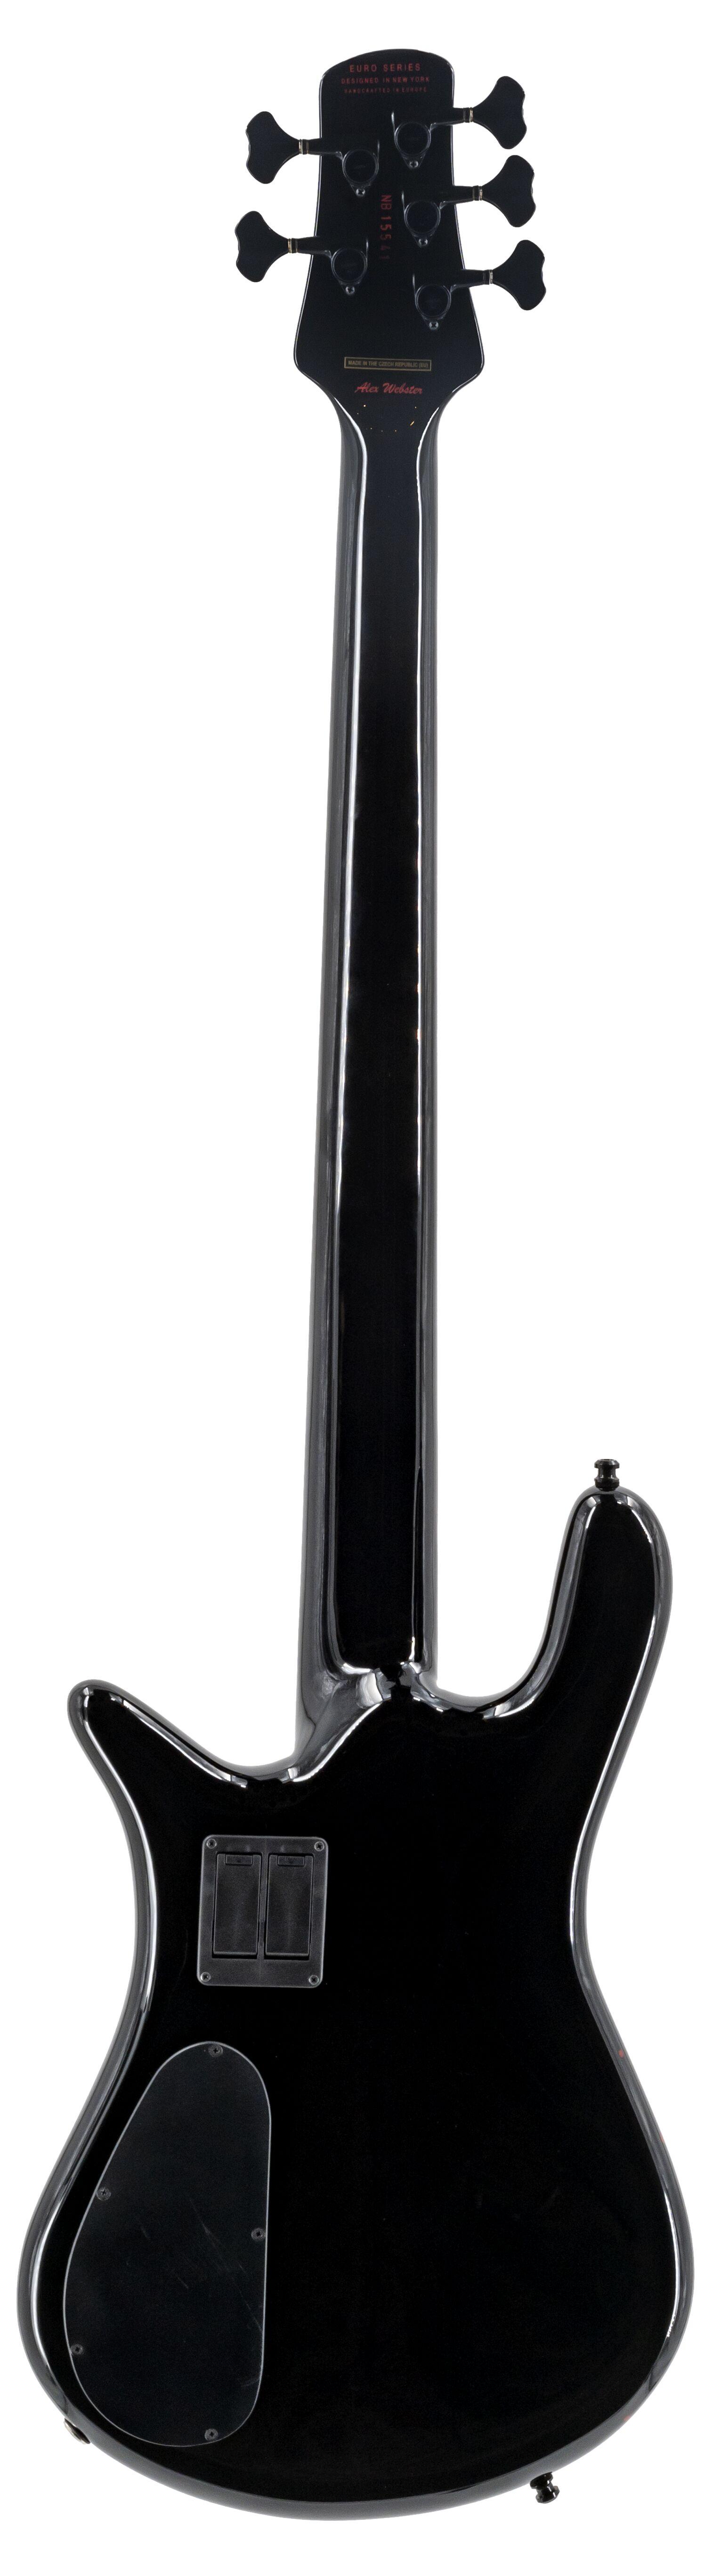 Spector Euro5 Alex Webster Standard 2, Solid Black Gloss